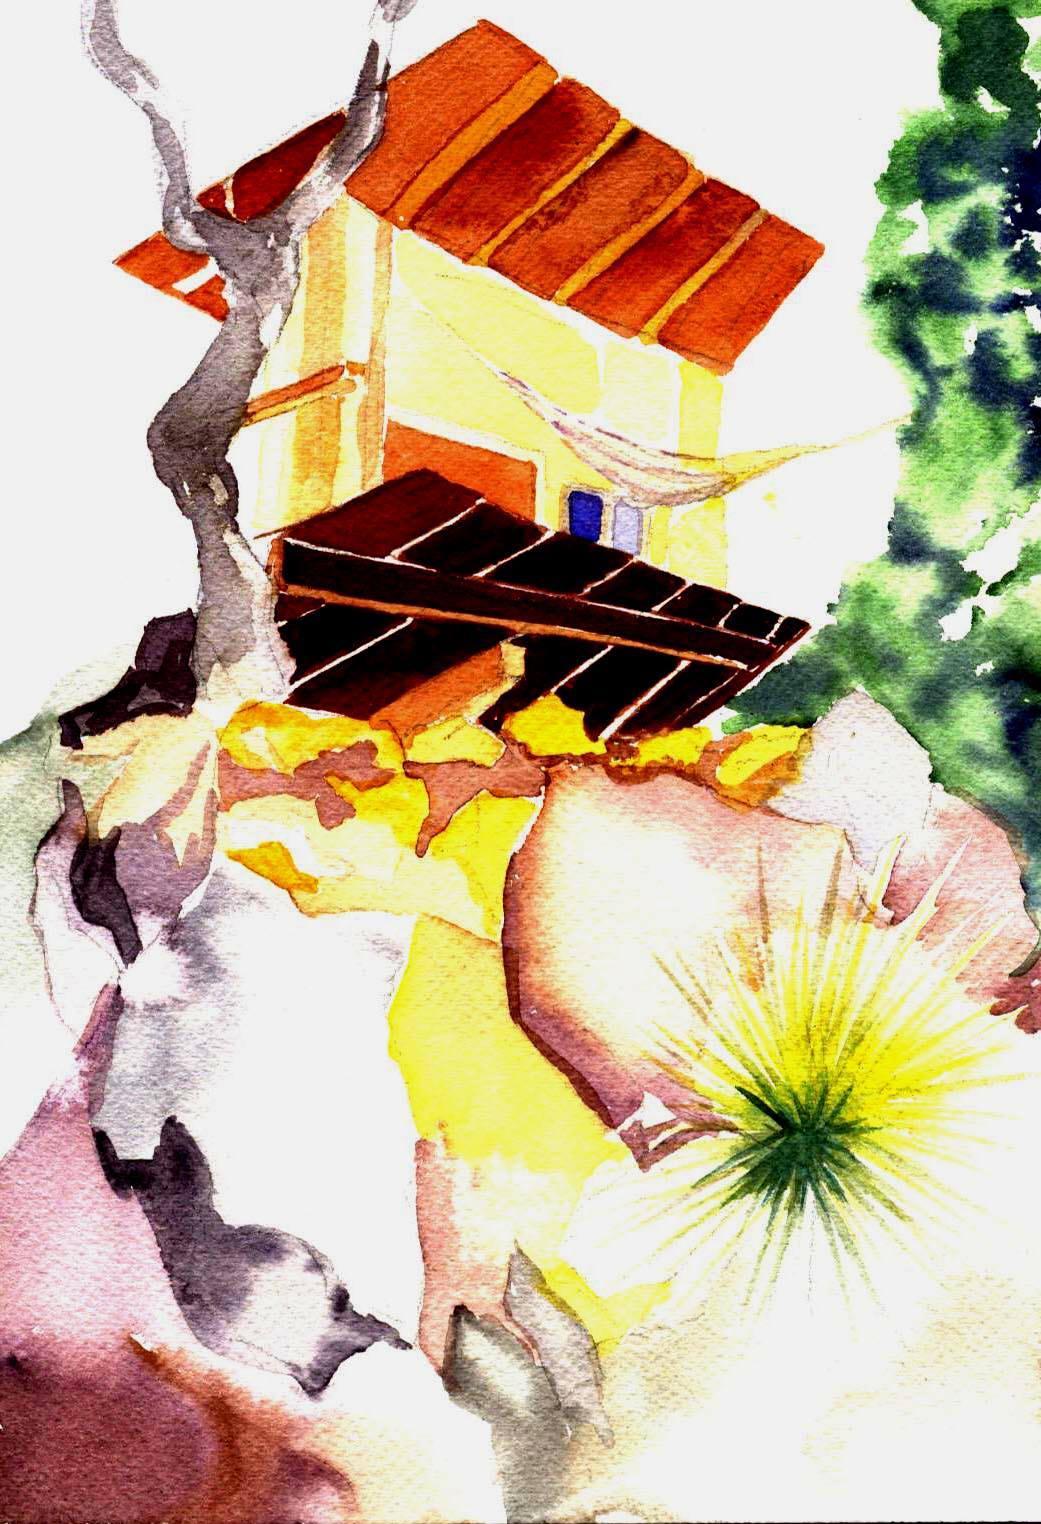 Tassajara Birdhouse